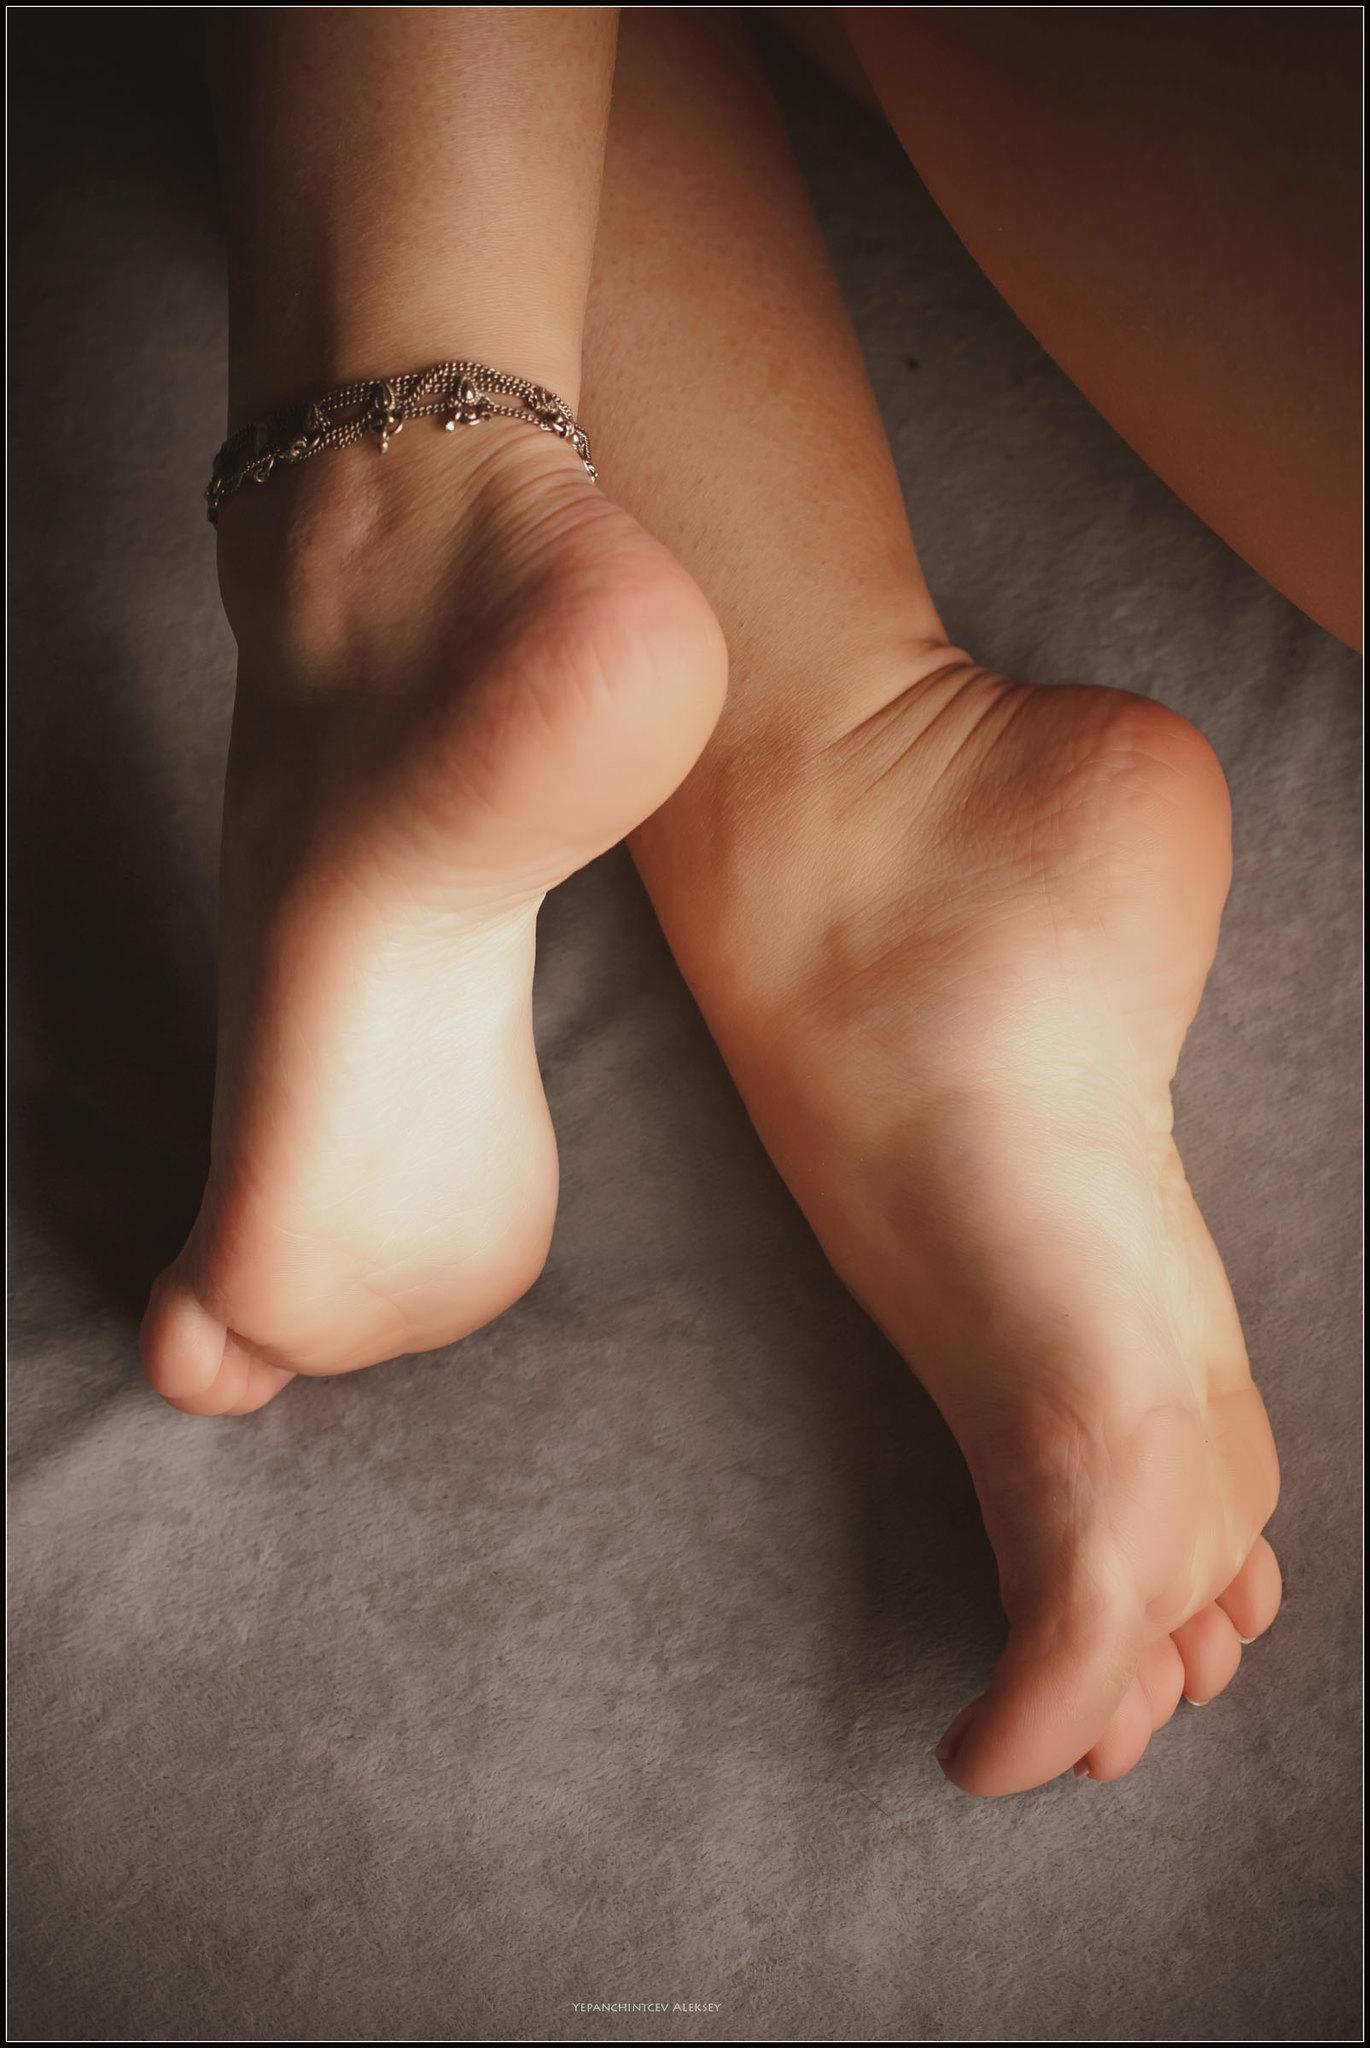 fotki-golih-piterskih-devushek